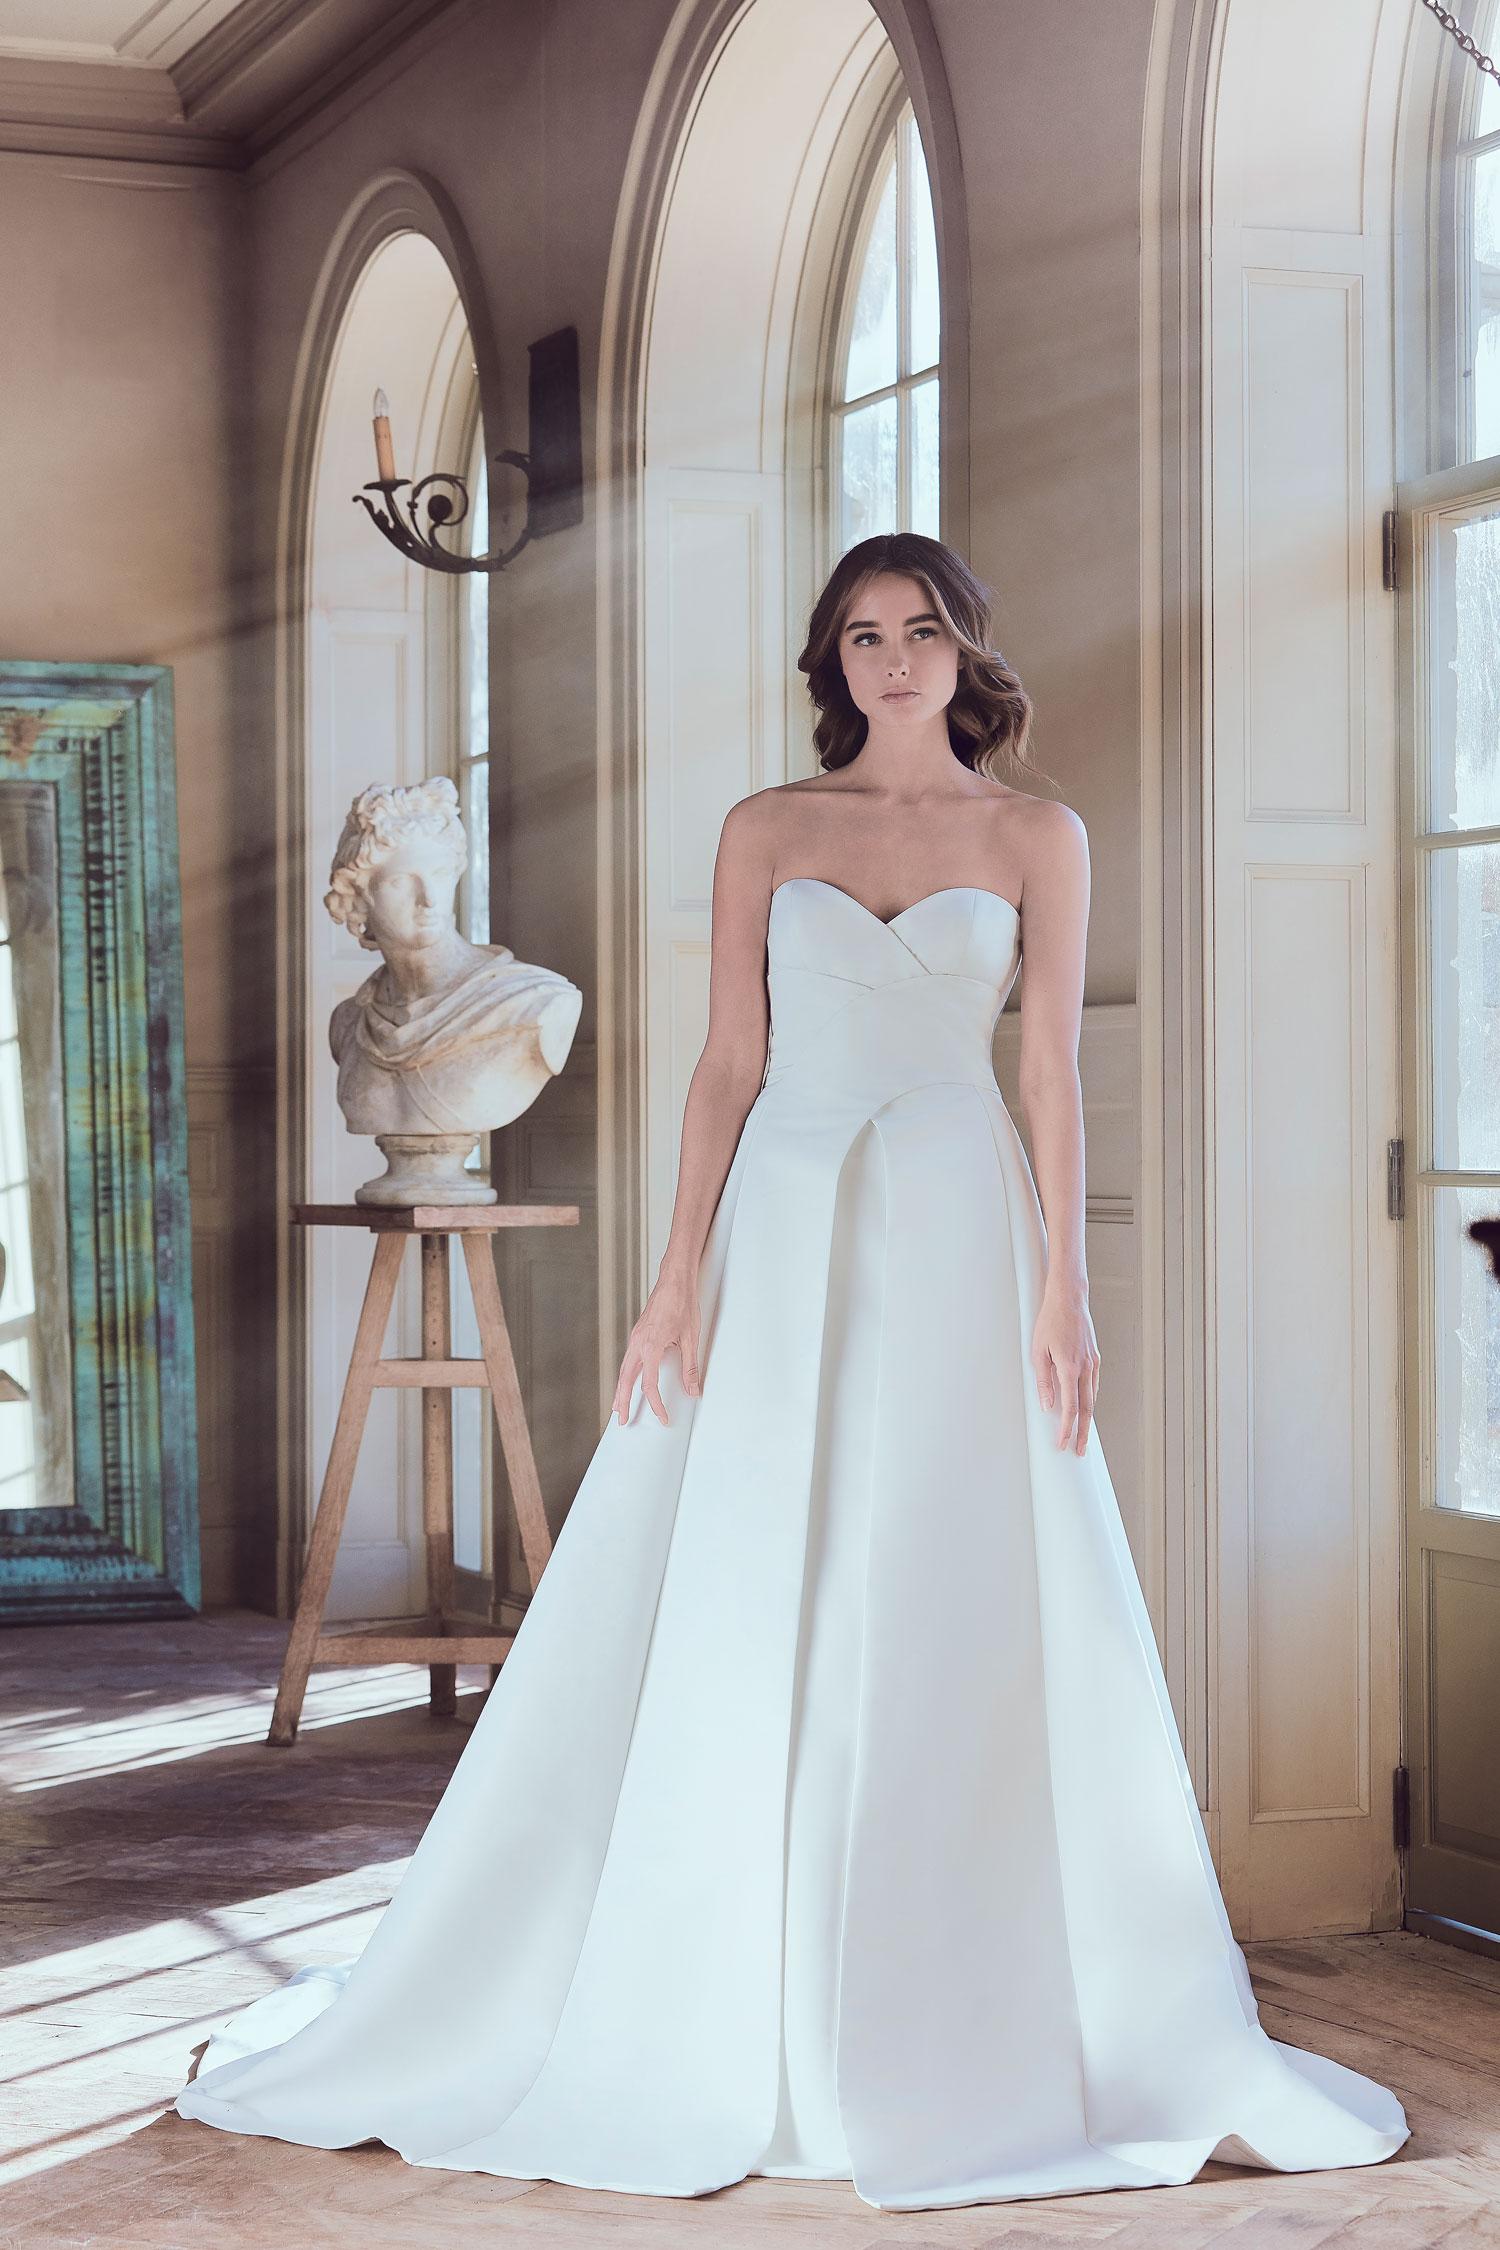 Strapless sweetheart neckline gown Sareh Nouri meghan markle sleek silk inspiration